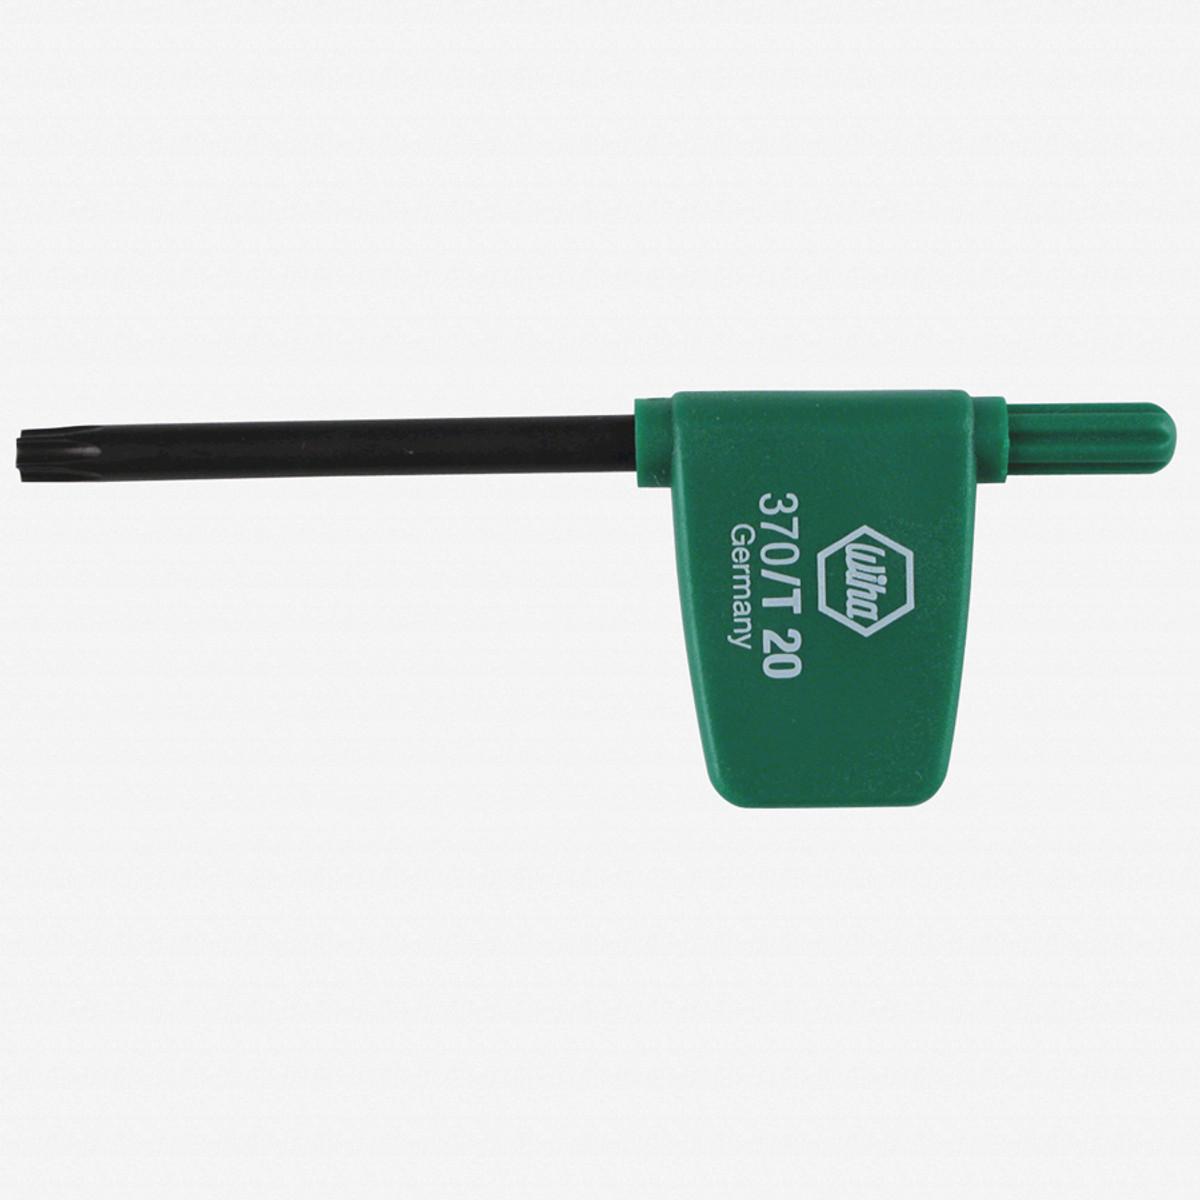 Wiha 37029 T10 x 40mm Torx Flag Handle - KC Tool